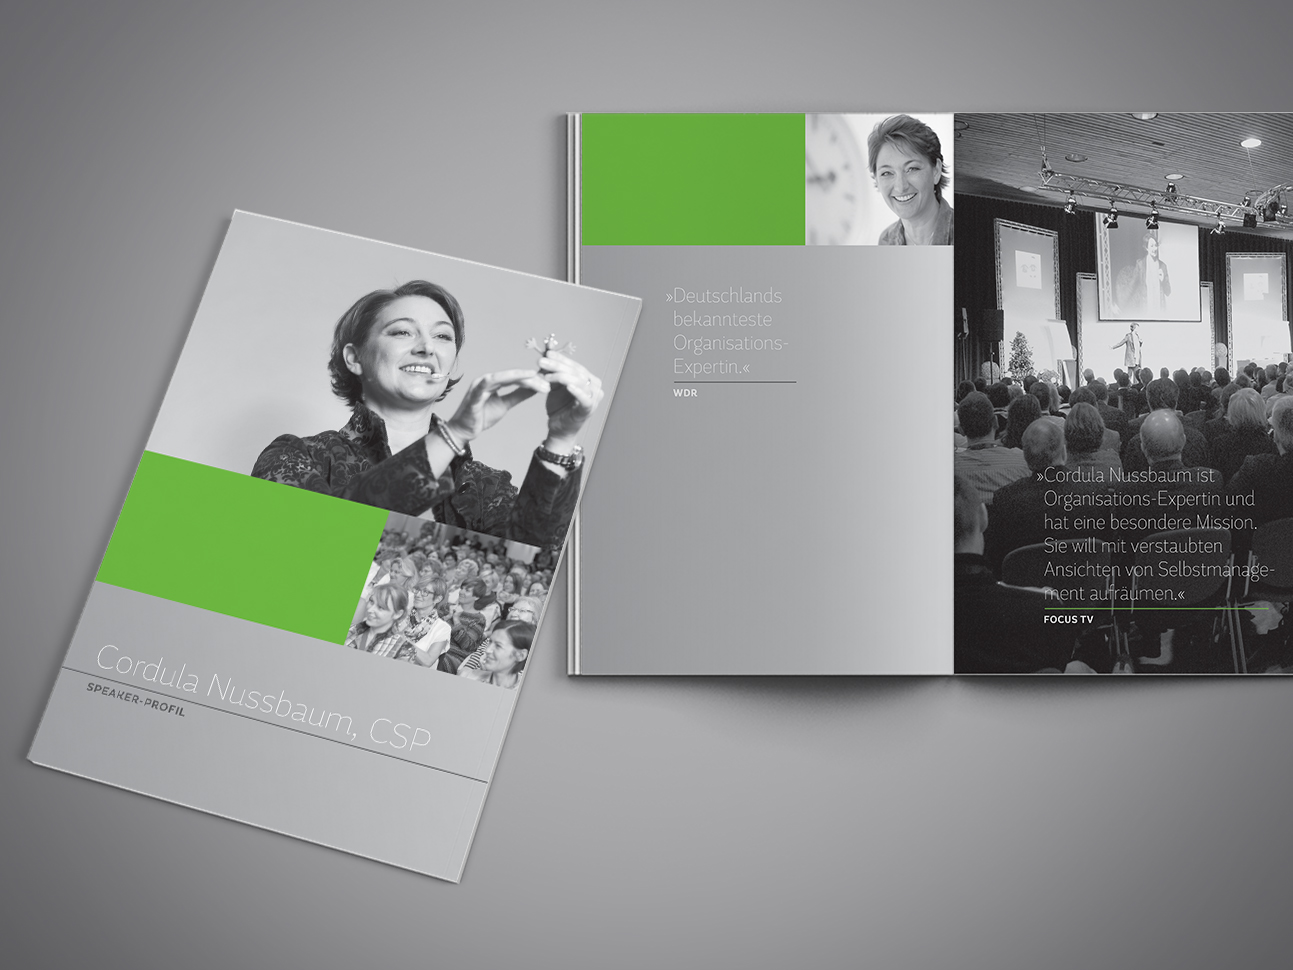 martin_zech_design_corporate_design_cordula_nussbaum_speaker-profil_cover_doppelseite